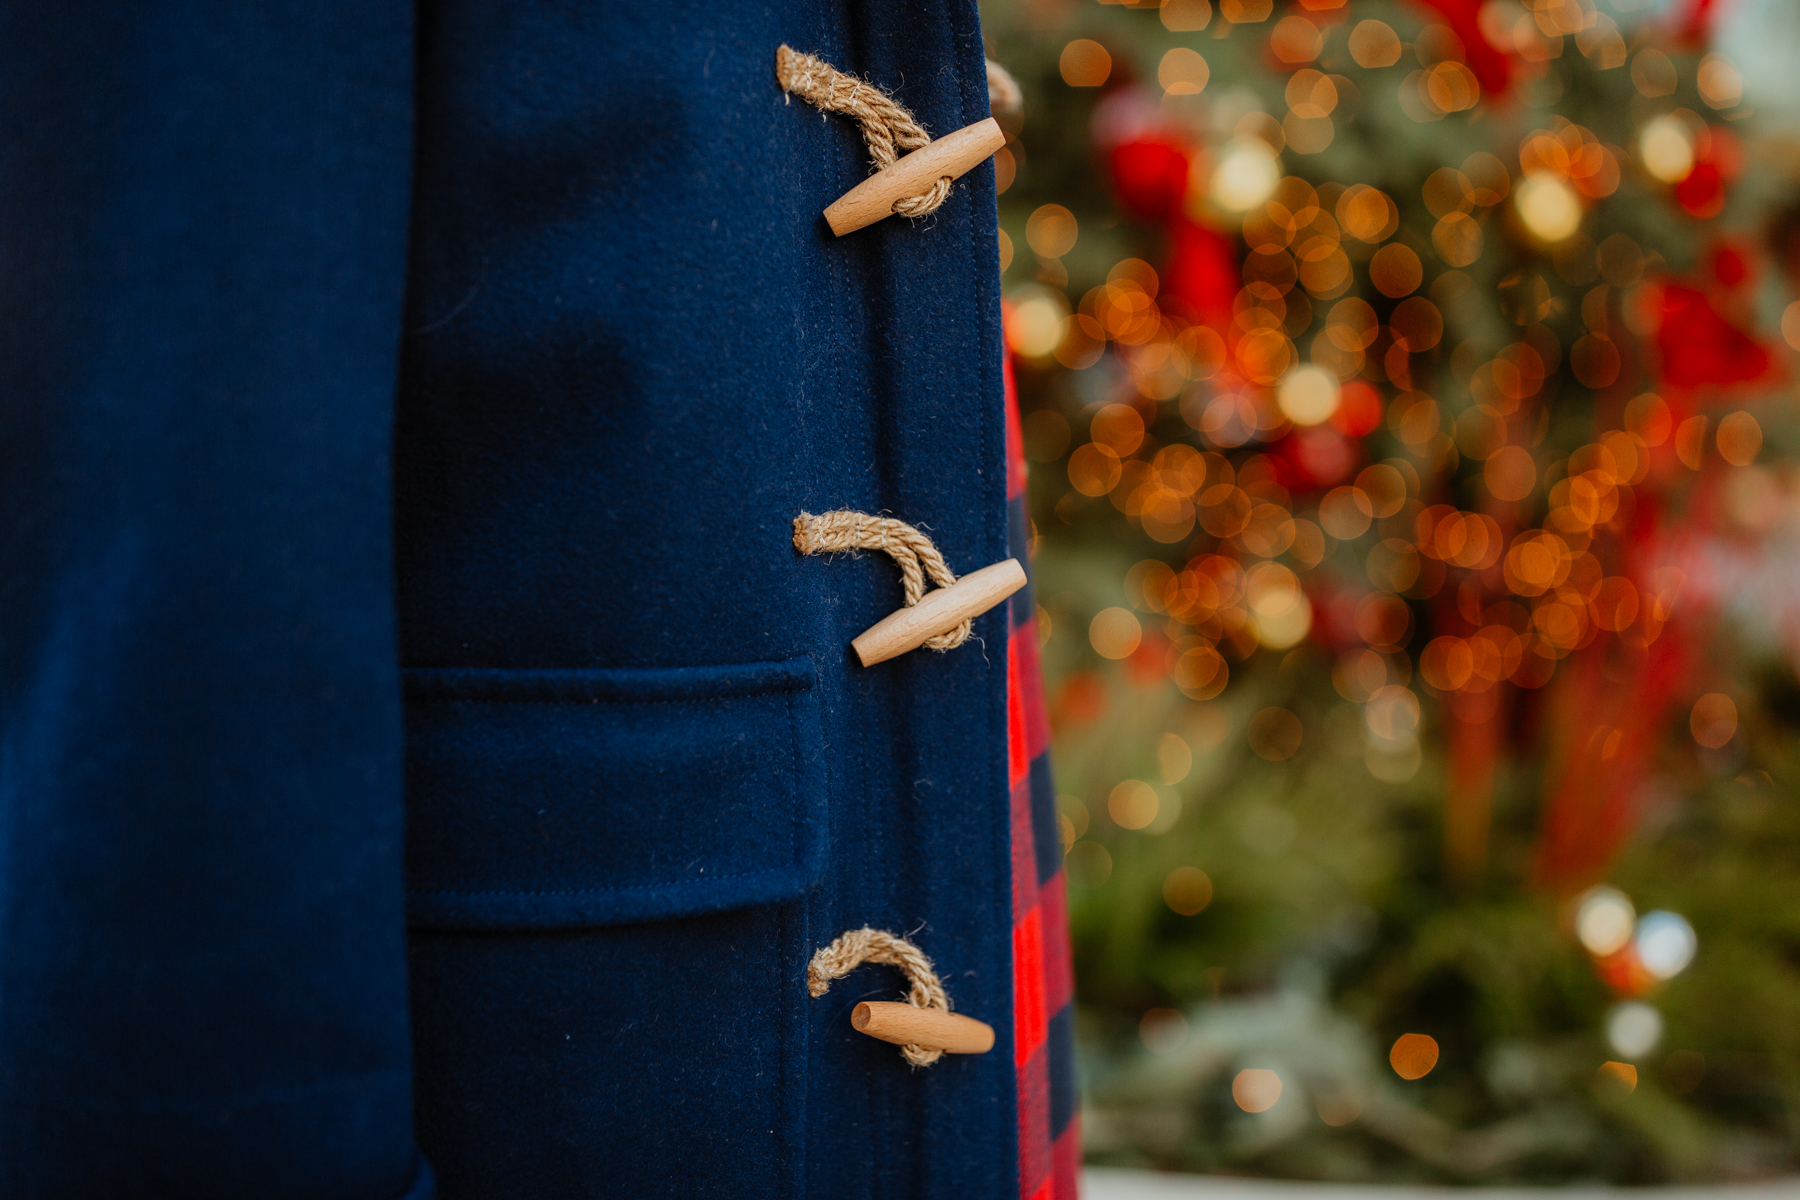 Navy Duffle Coat(On sale!)